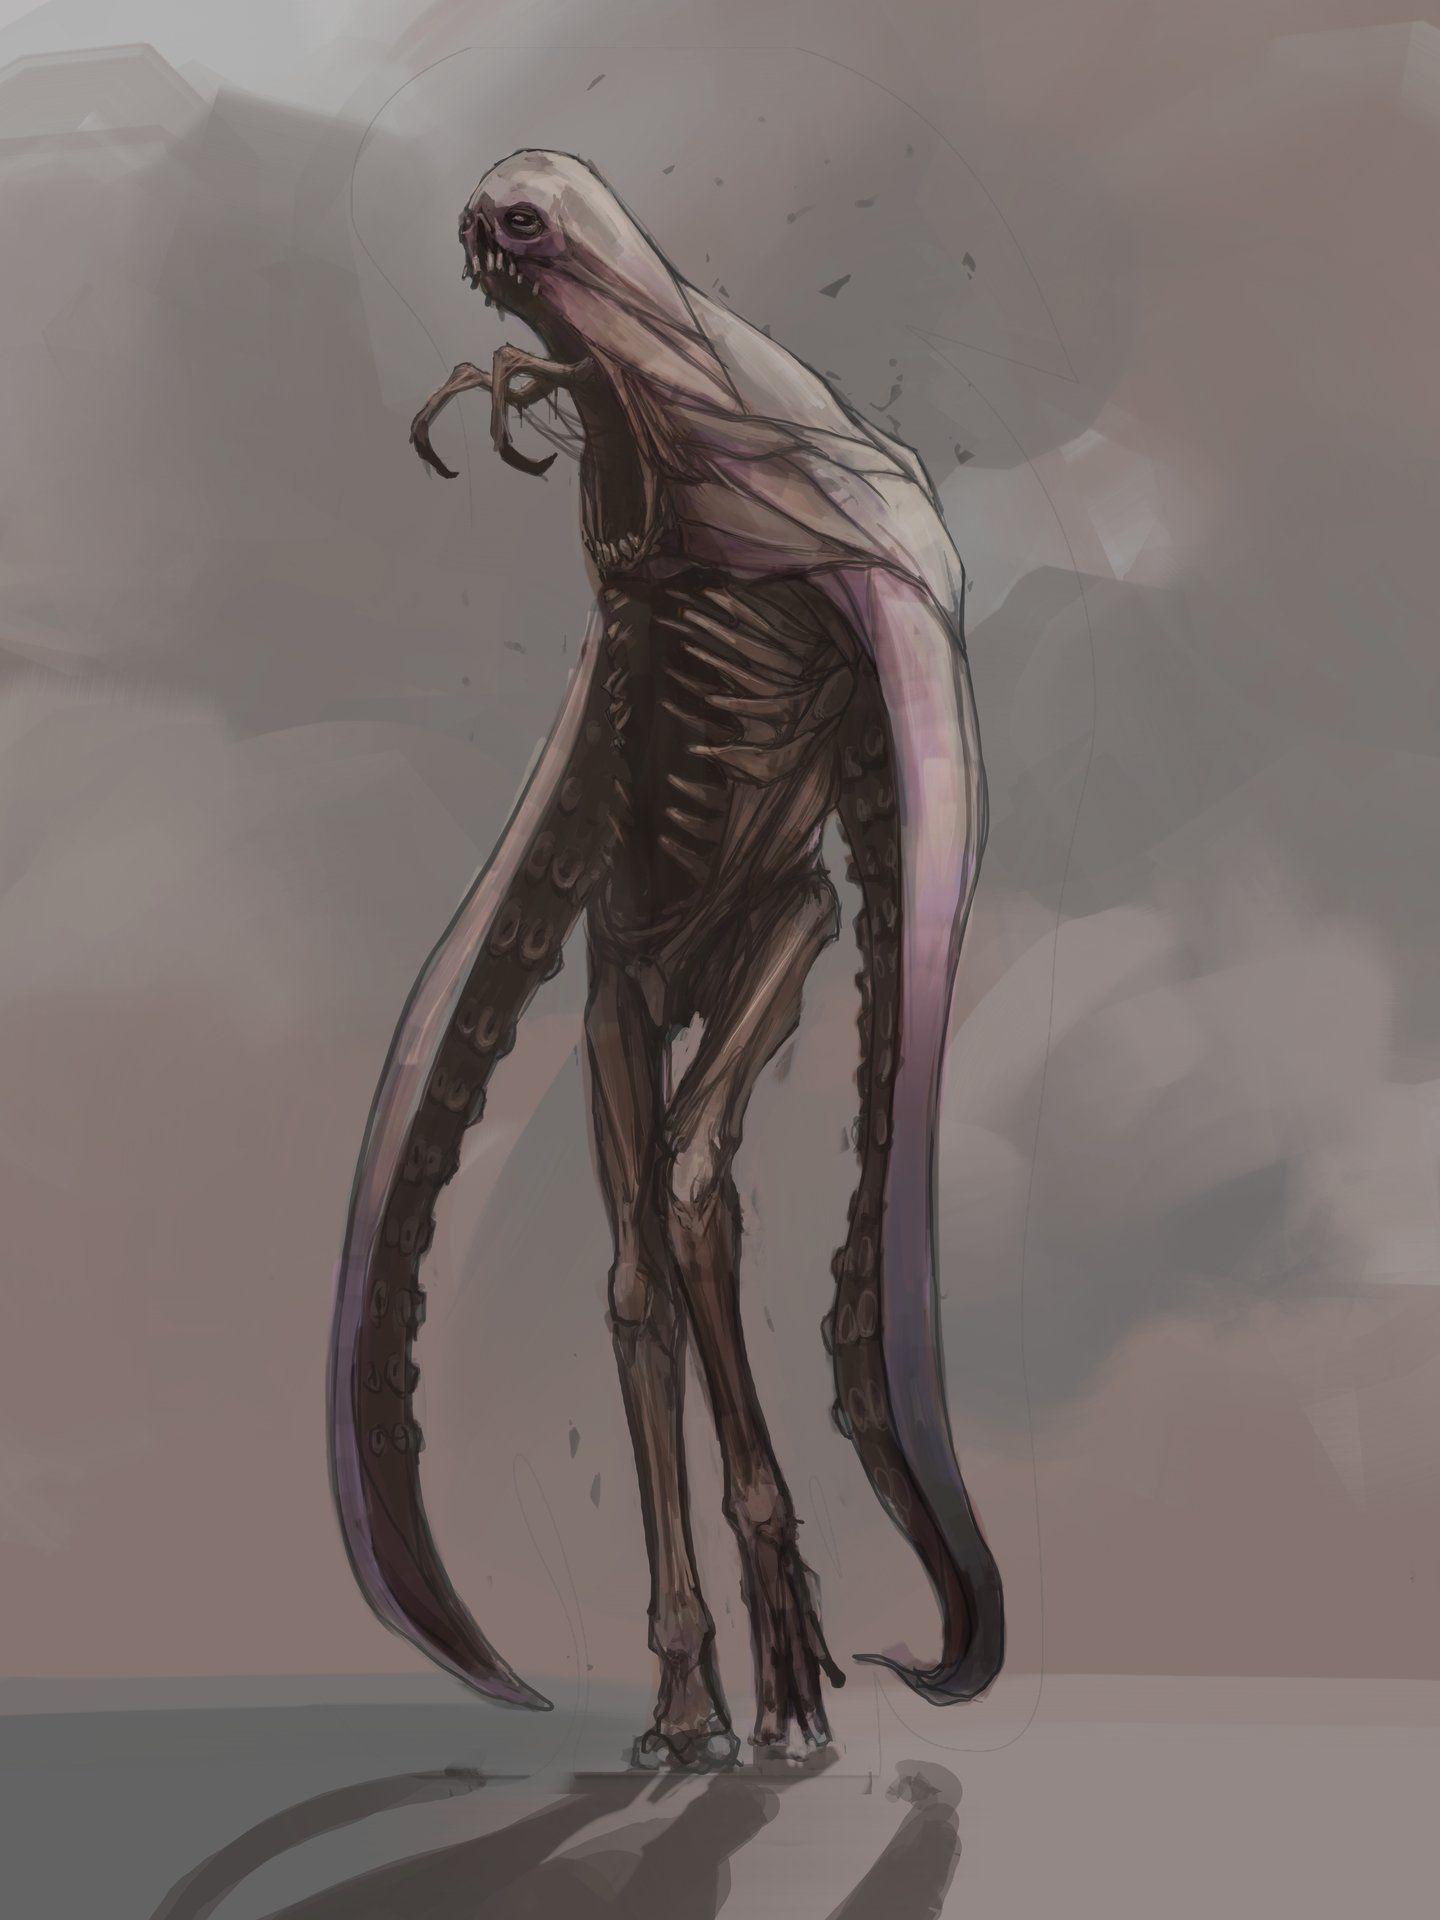 """abominations"" by Shane Walters https://www.artstation.com/artwork/abominations-44535ba1-bde7-40d1-87ce-2dcdd0ca07d4?utm_content=bufferae02b&utm_medium=social&utm_source=pinterest.com&utm_campaign=buffer #creaturedesign #creatureart #2dart #conceptart"